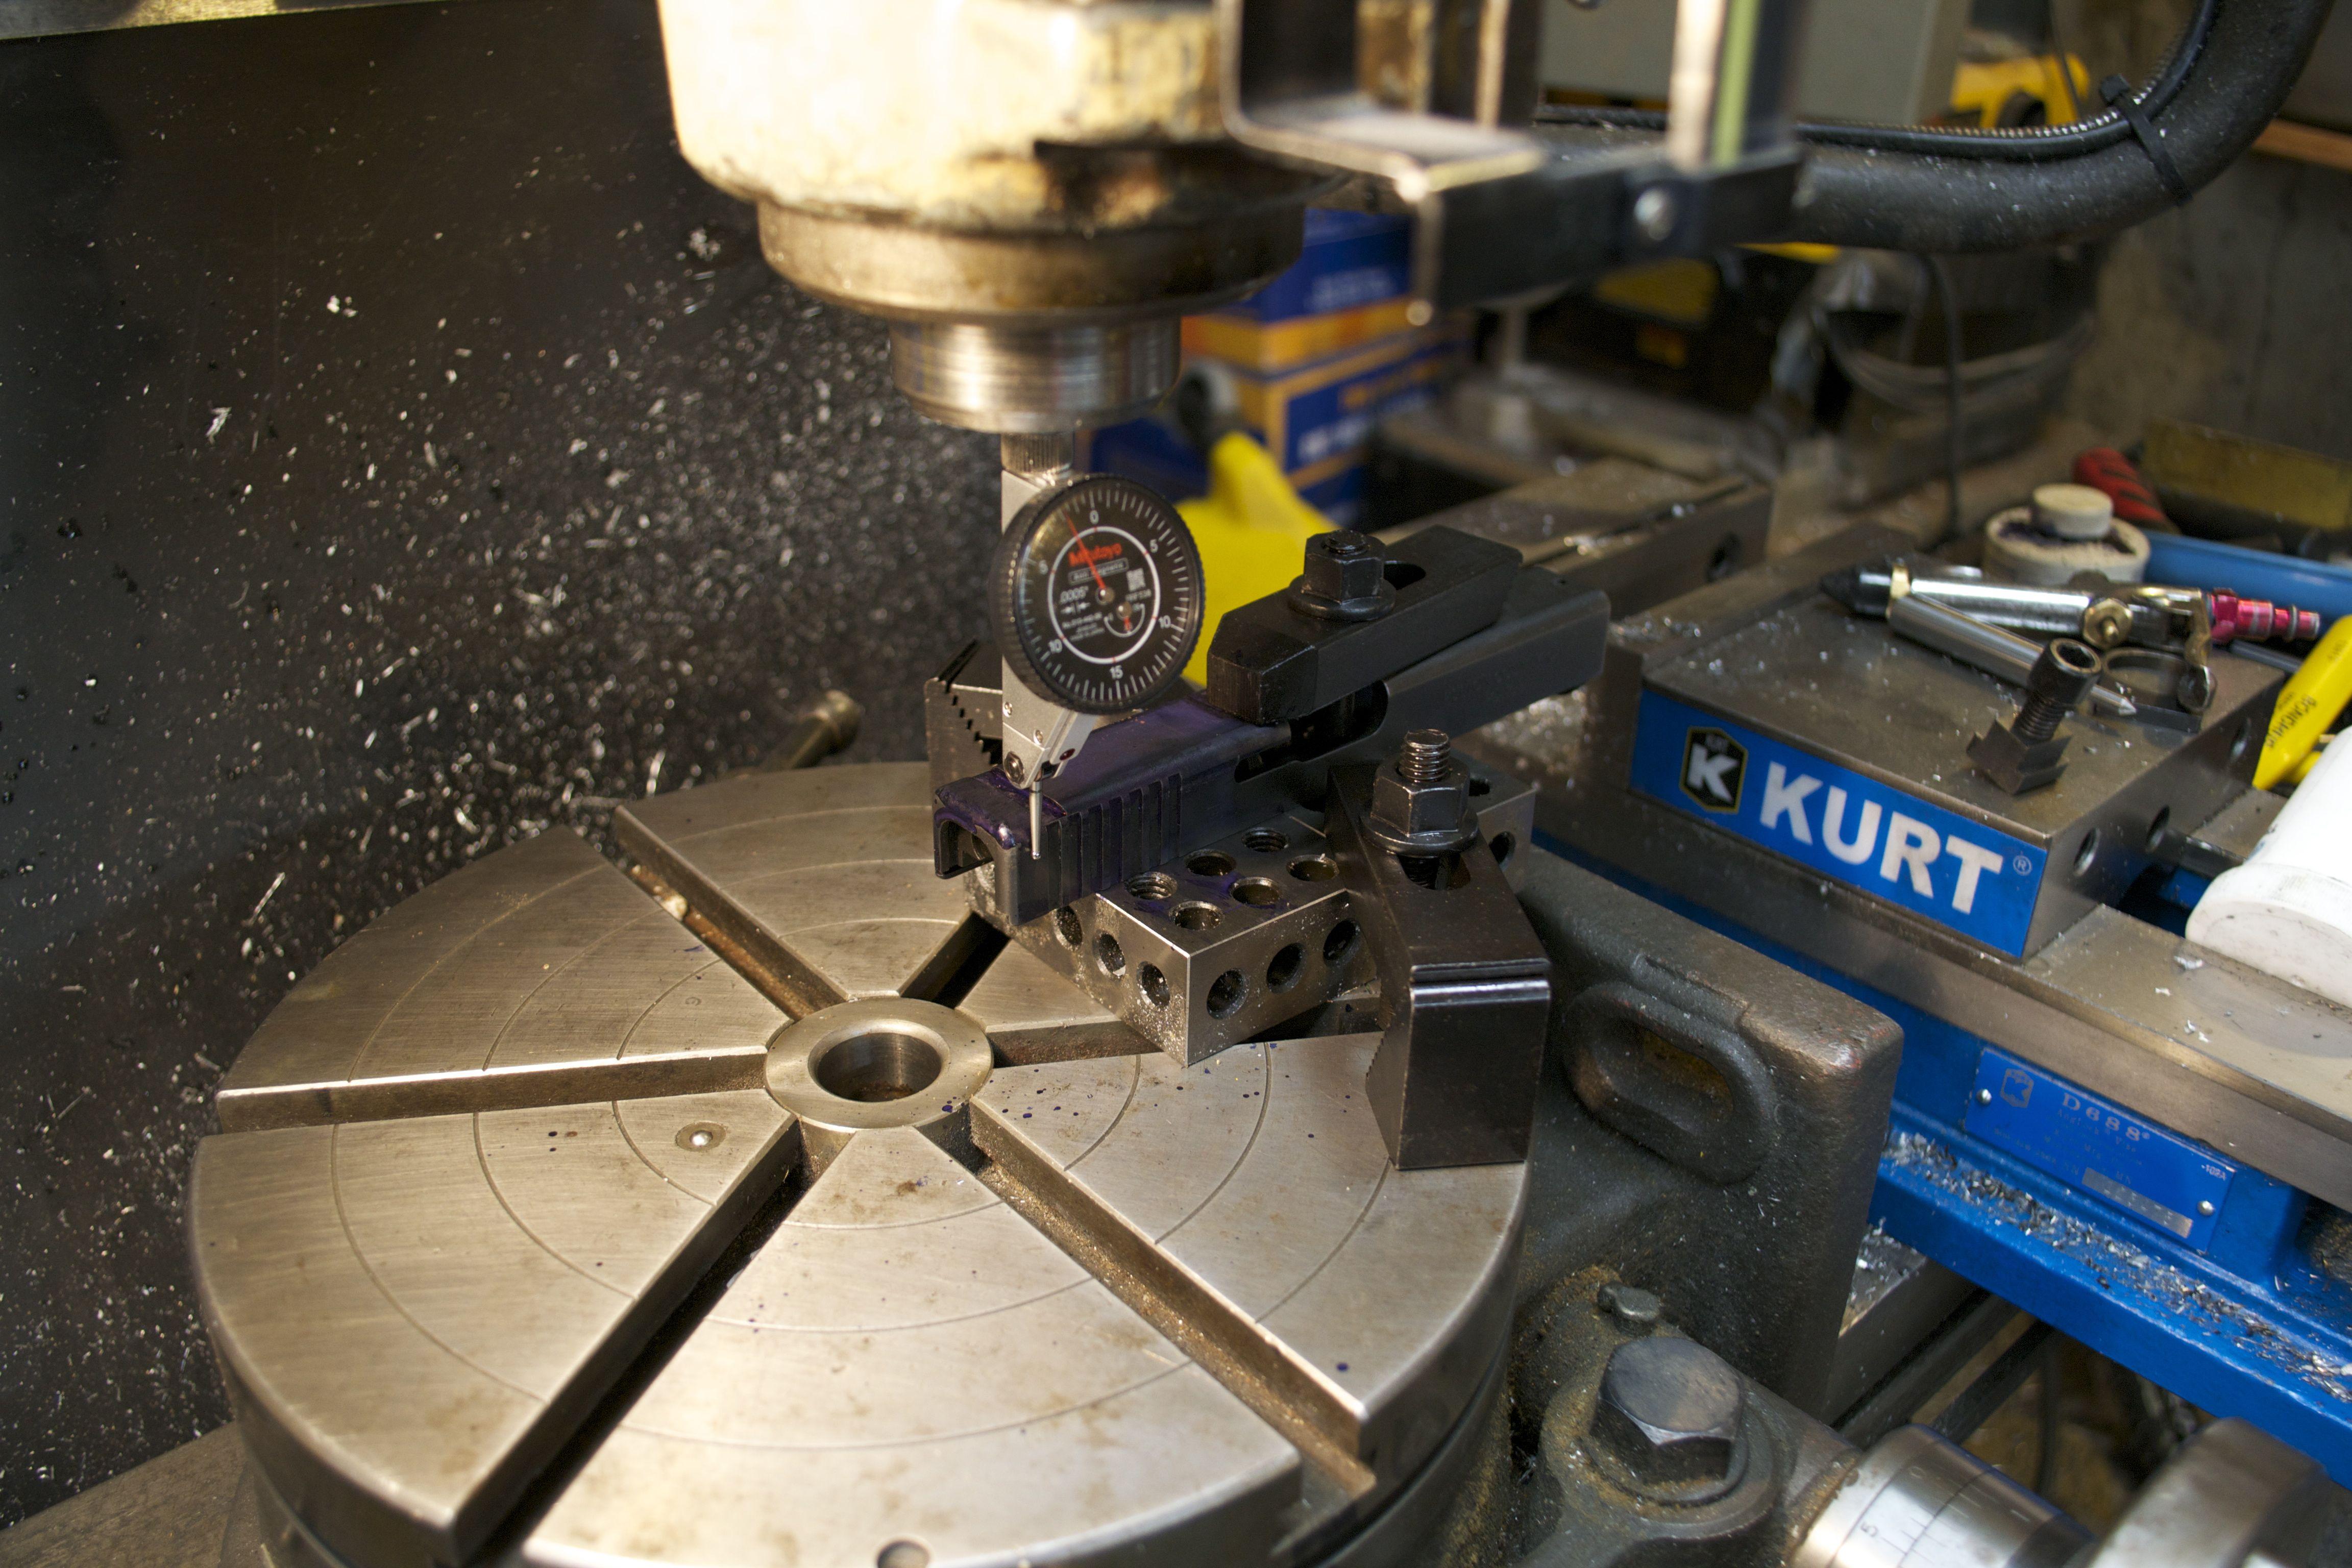 Machining a Glock slide for a Trijicon RMR cut